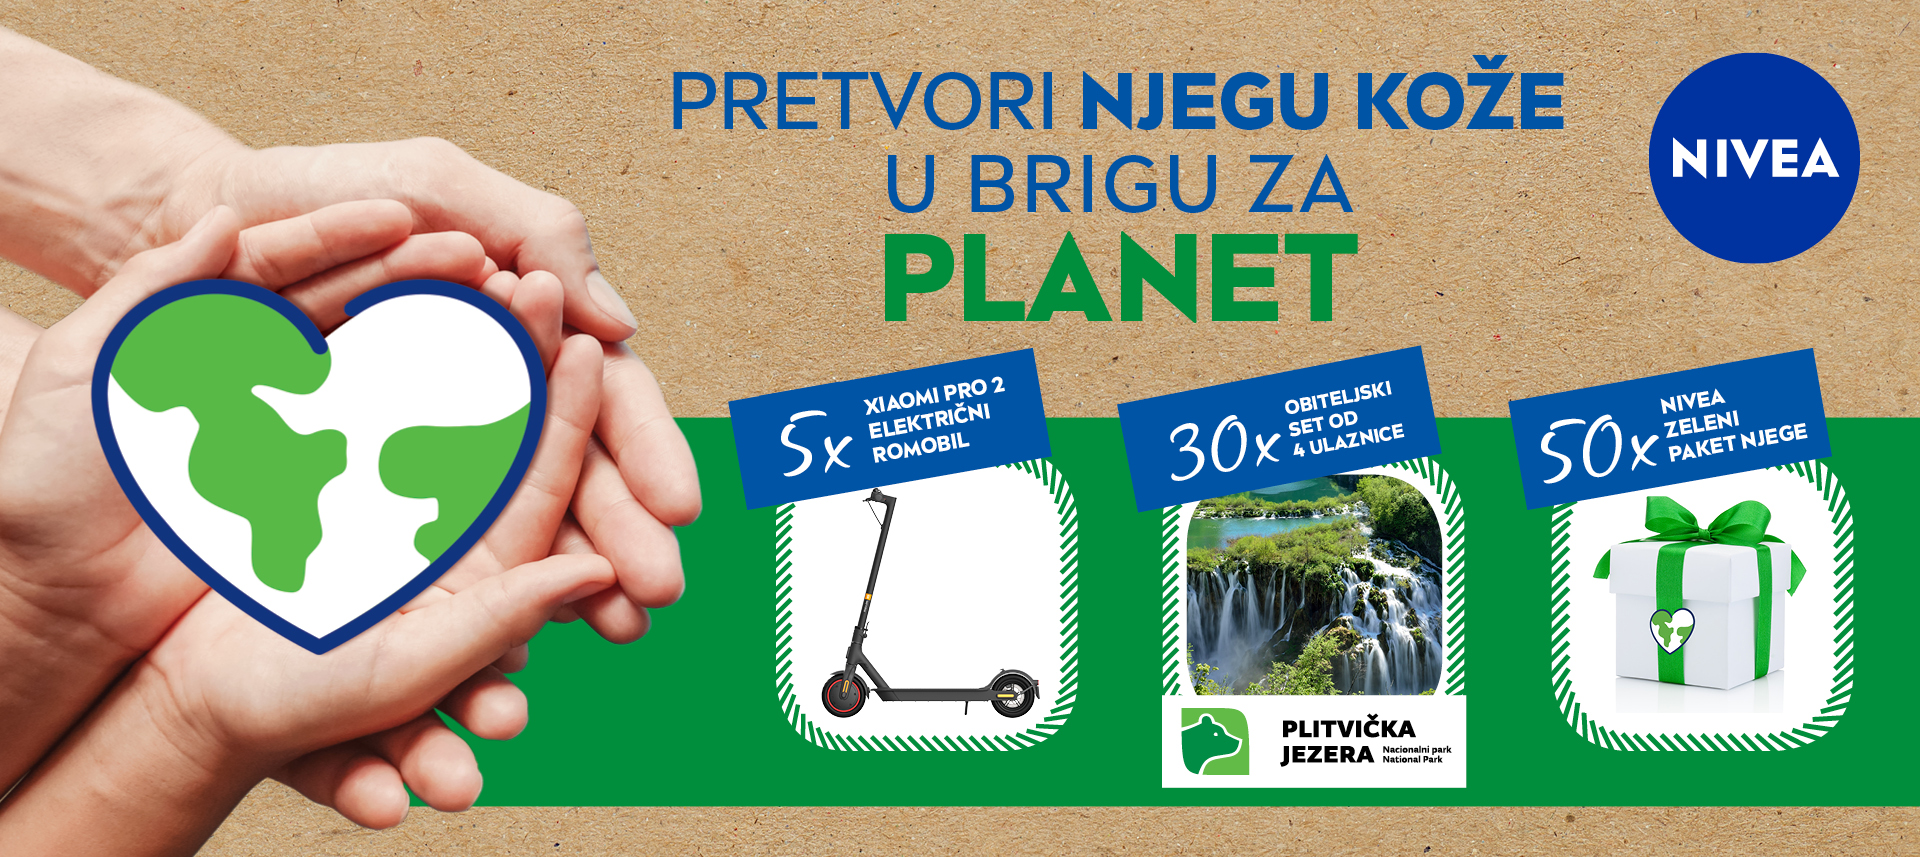 NIVEA Sustainability NI&Konzum banner 1920x857px.jpg